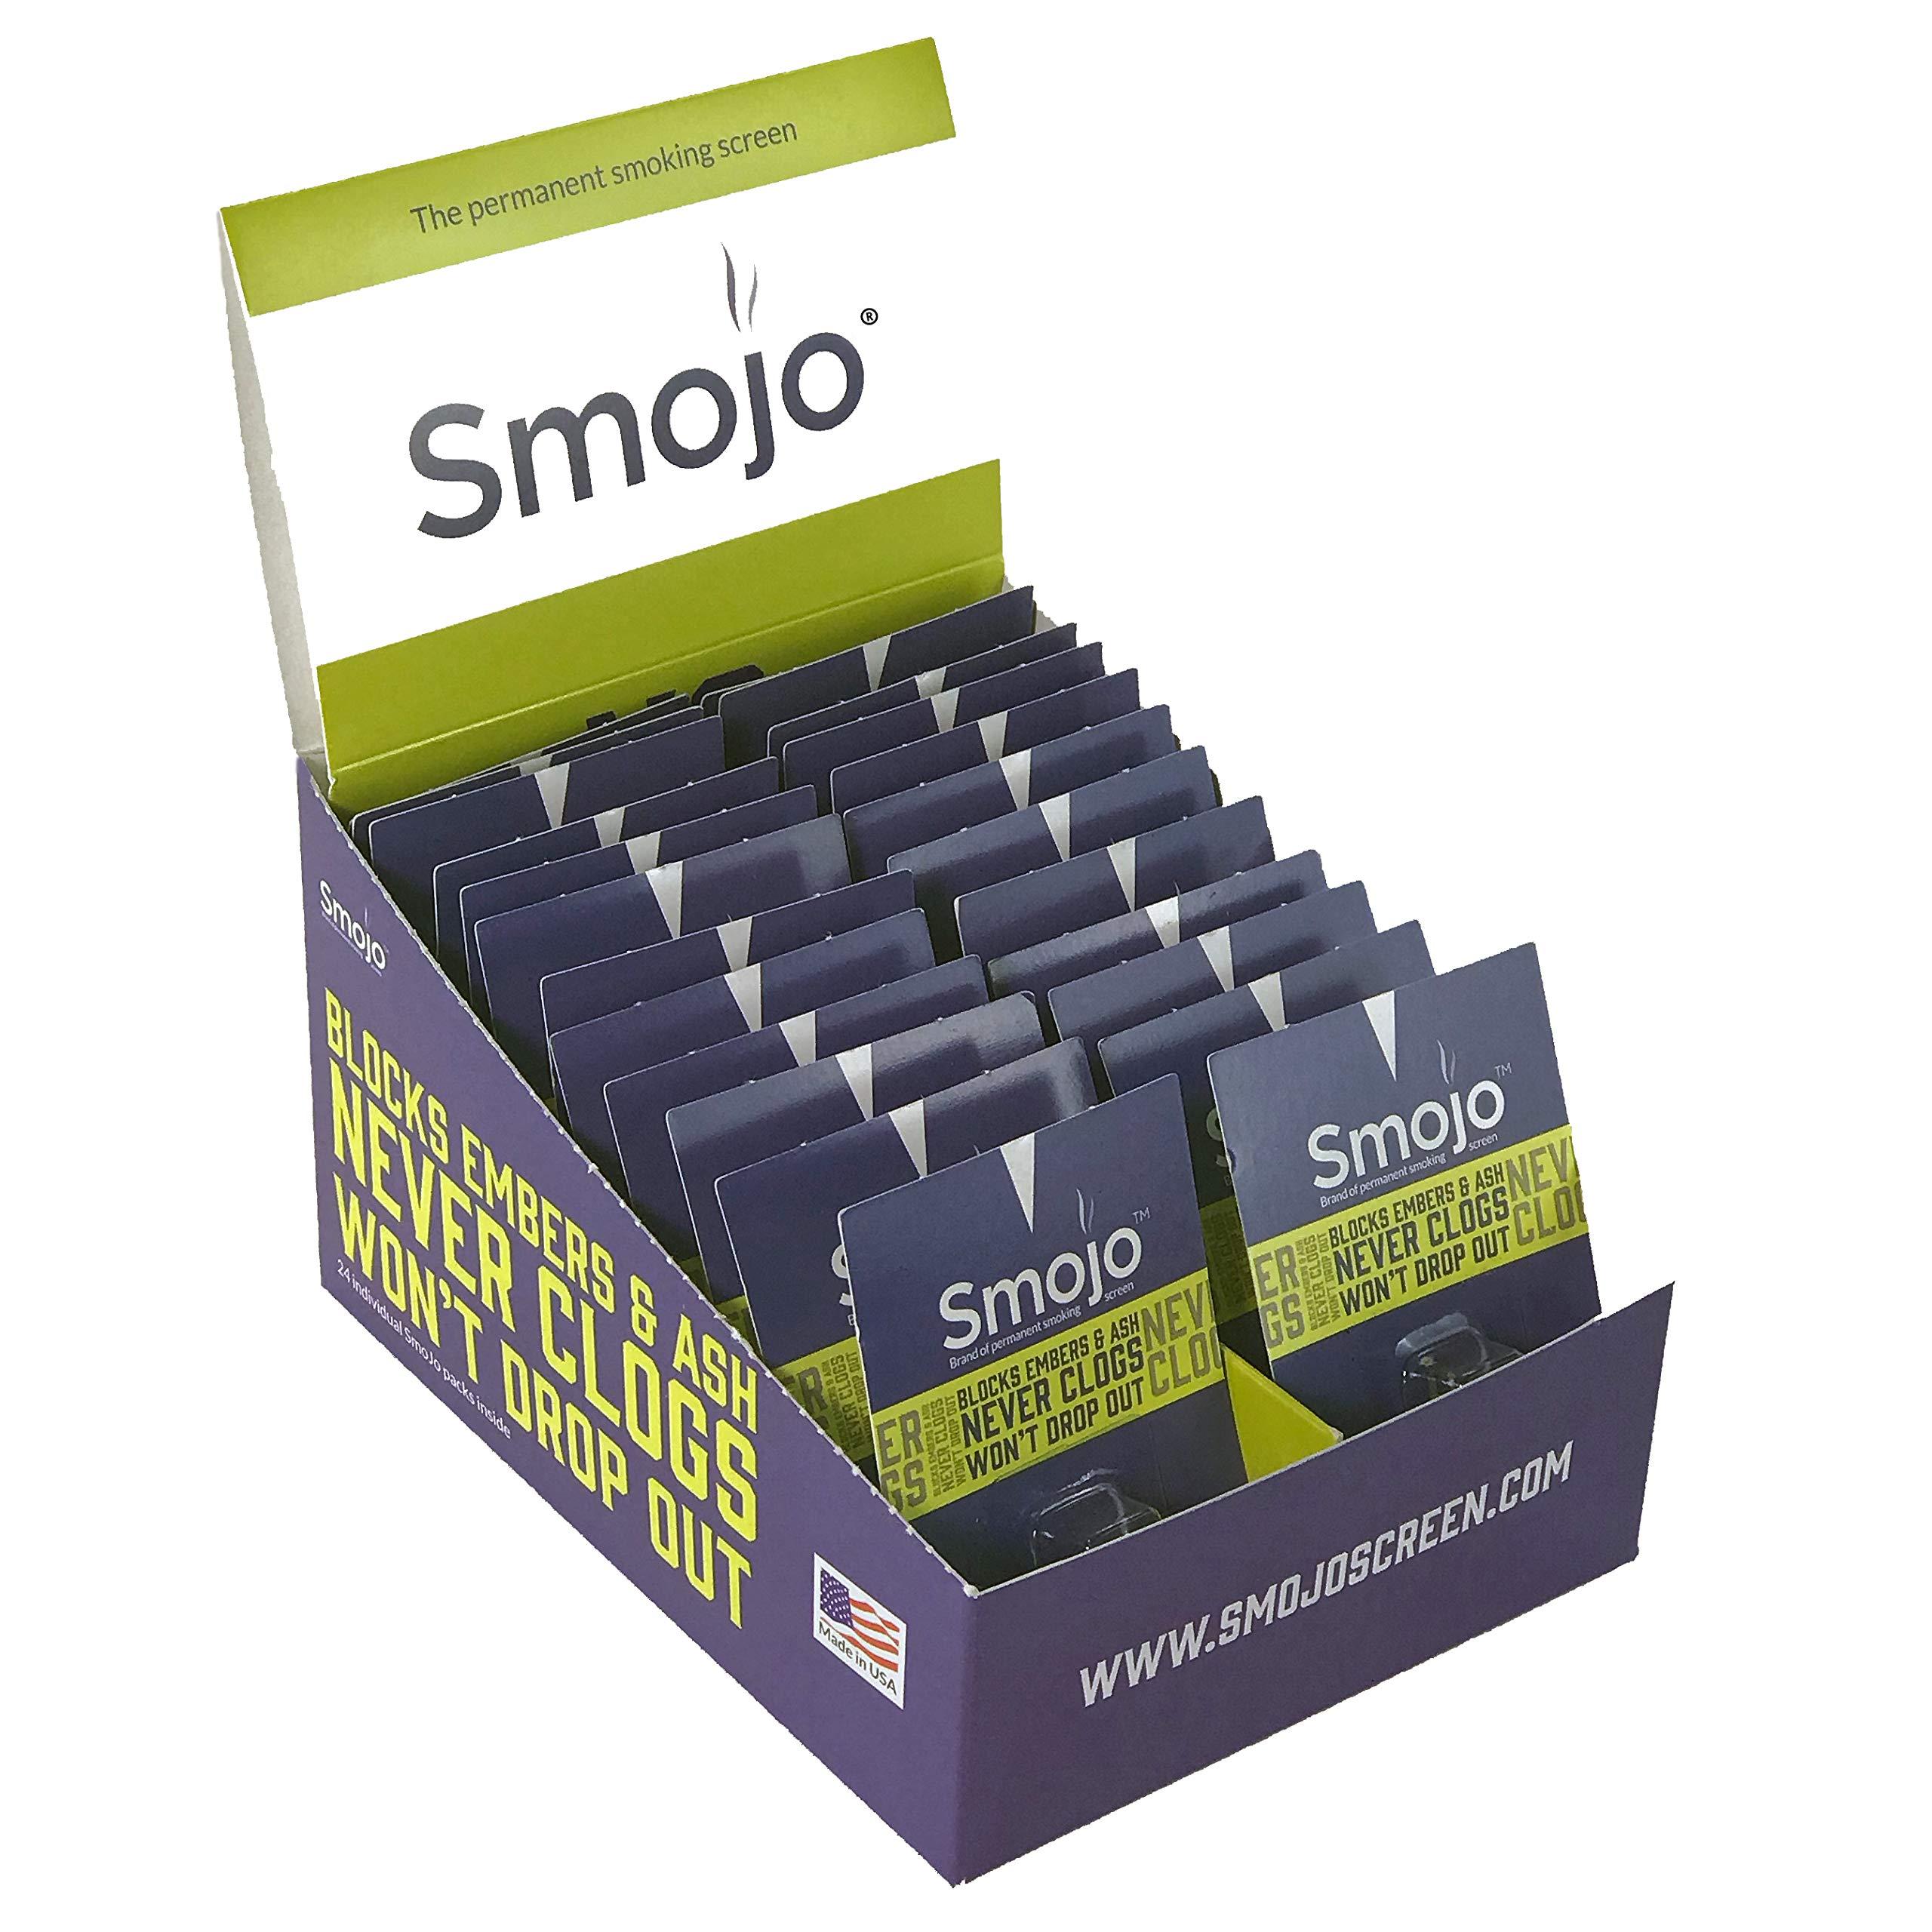 Smojo Permanent Smoking Screen (Pop-n-Shop Container of 24 Regular Single Packs) by Smojo